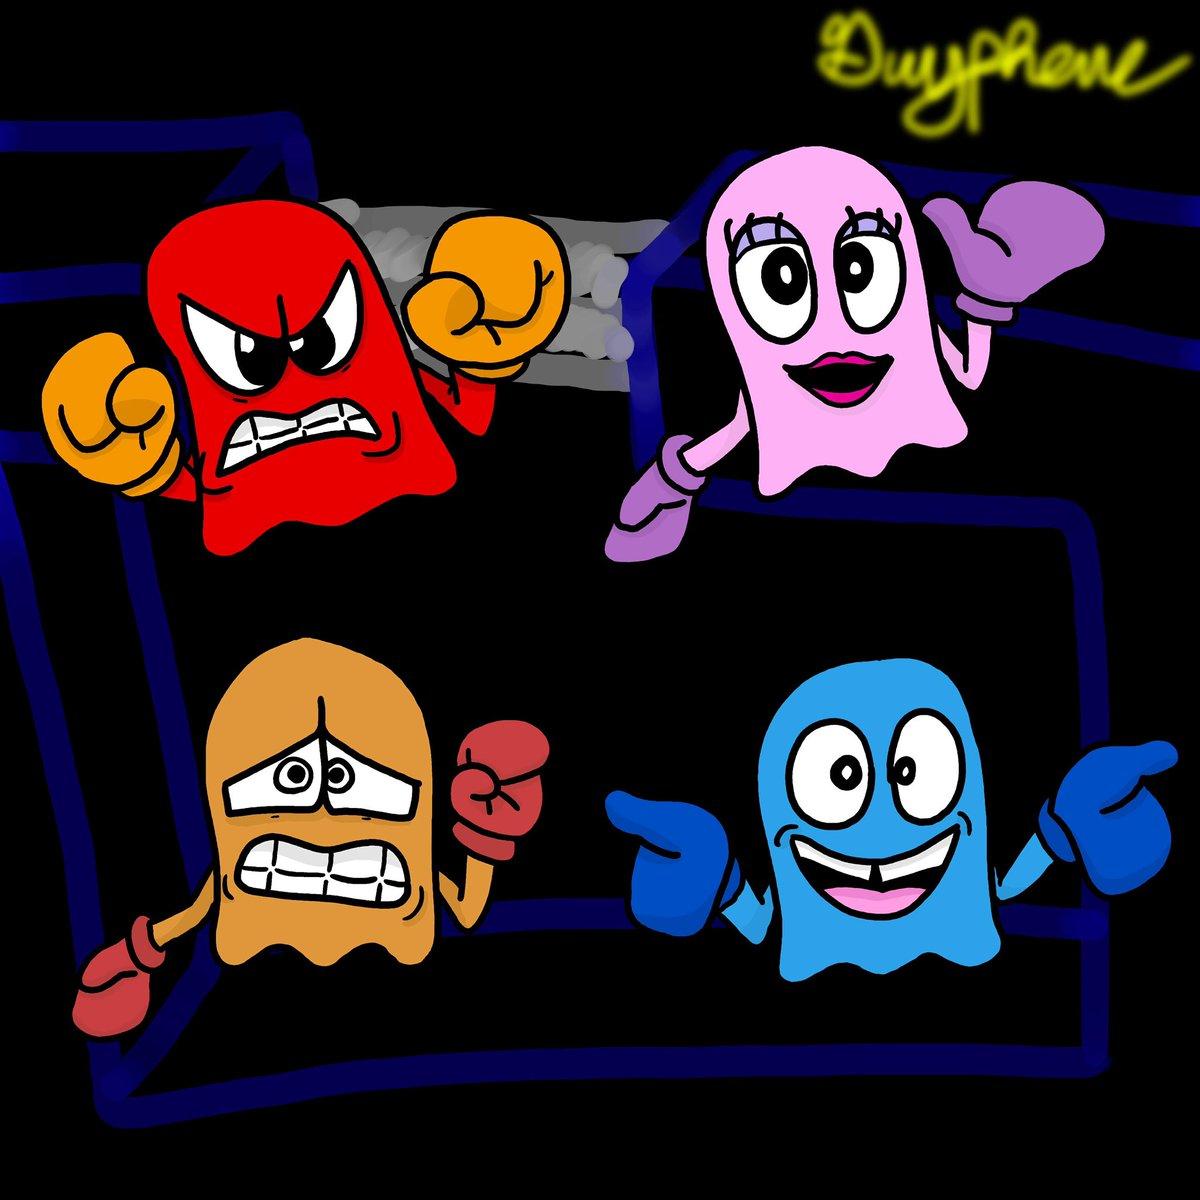 Some spookies! #PacMan #digitalartpic.twitter.com/9sYKkrkOVY